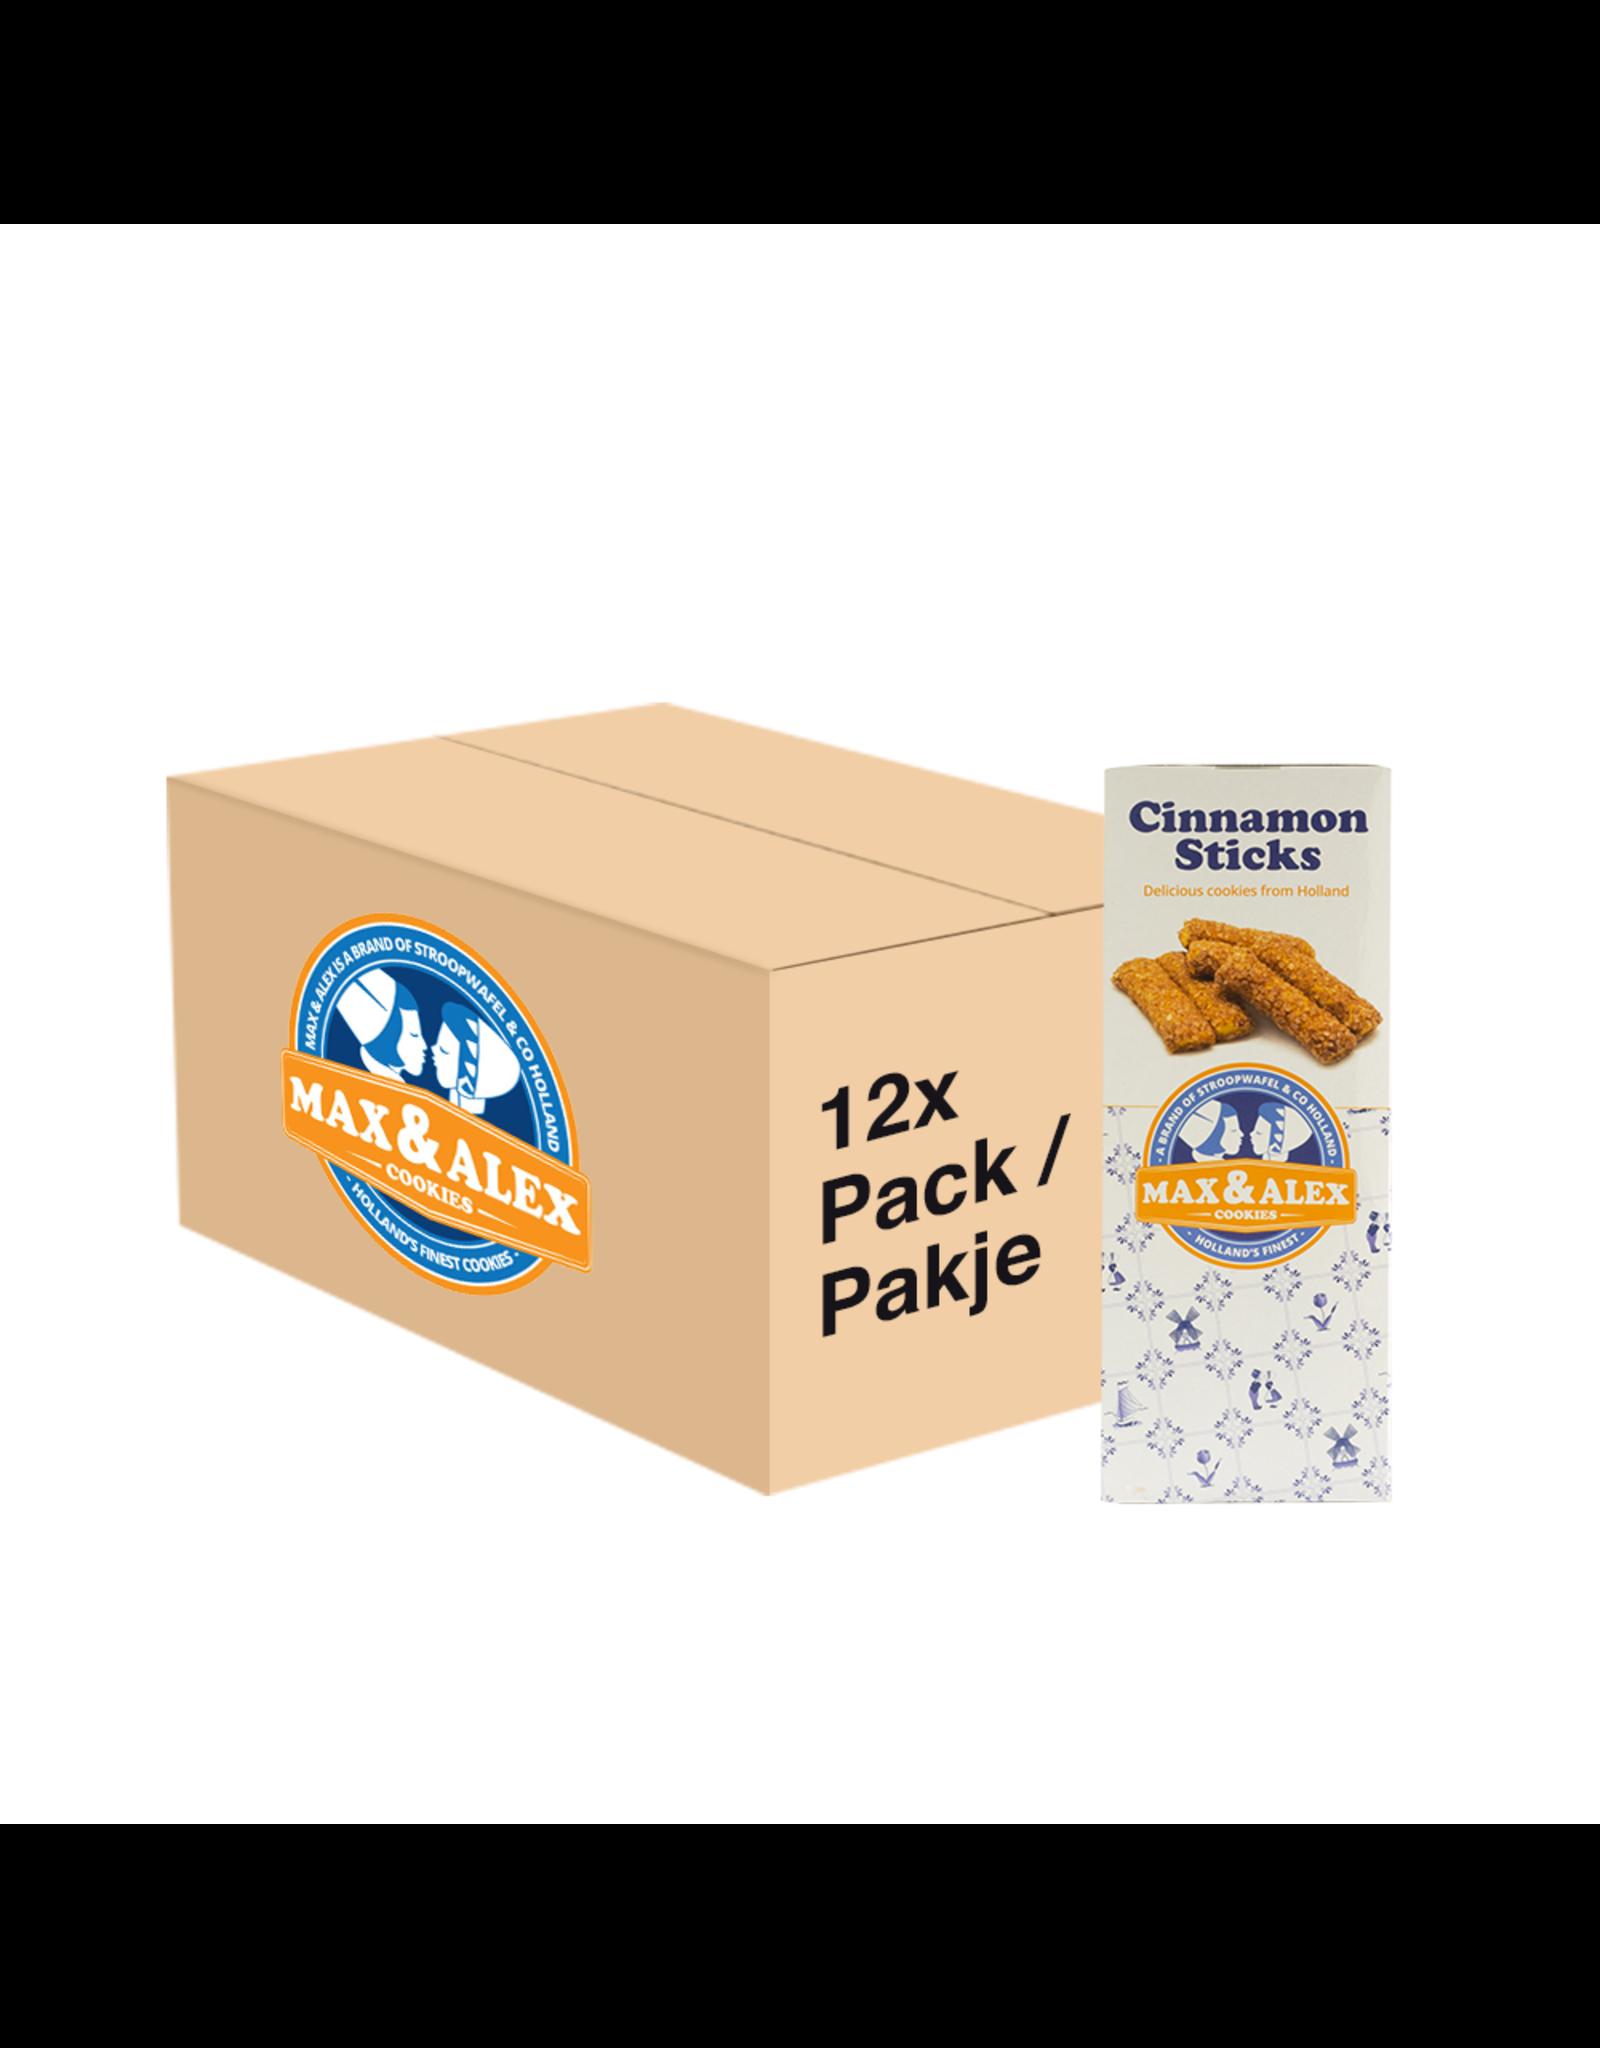 Max & Alex Max & Alex Batonnets de cannelle (200 gram) 12x - carton principal